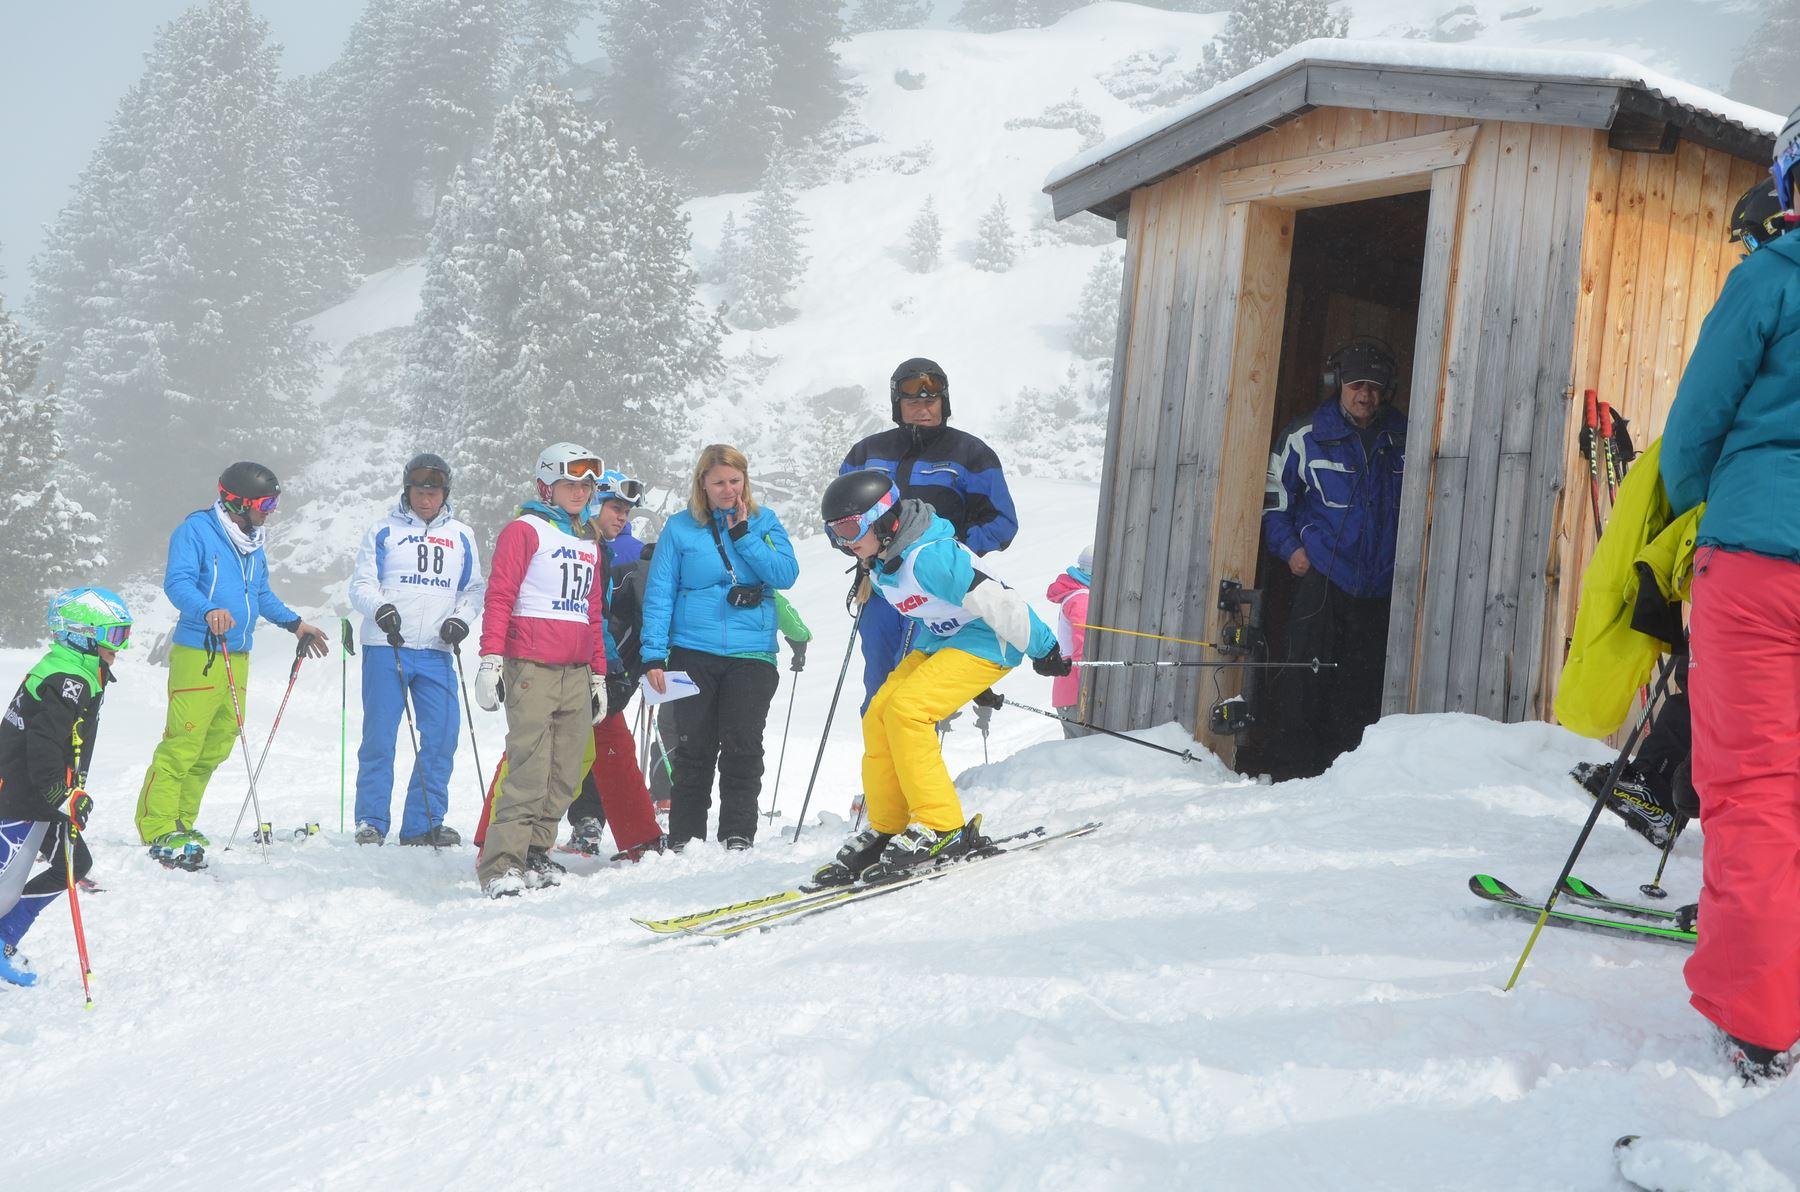 2015-03-22 BV Zillertal Skirennen 081.JPG